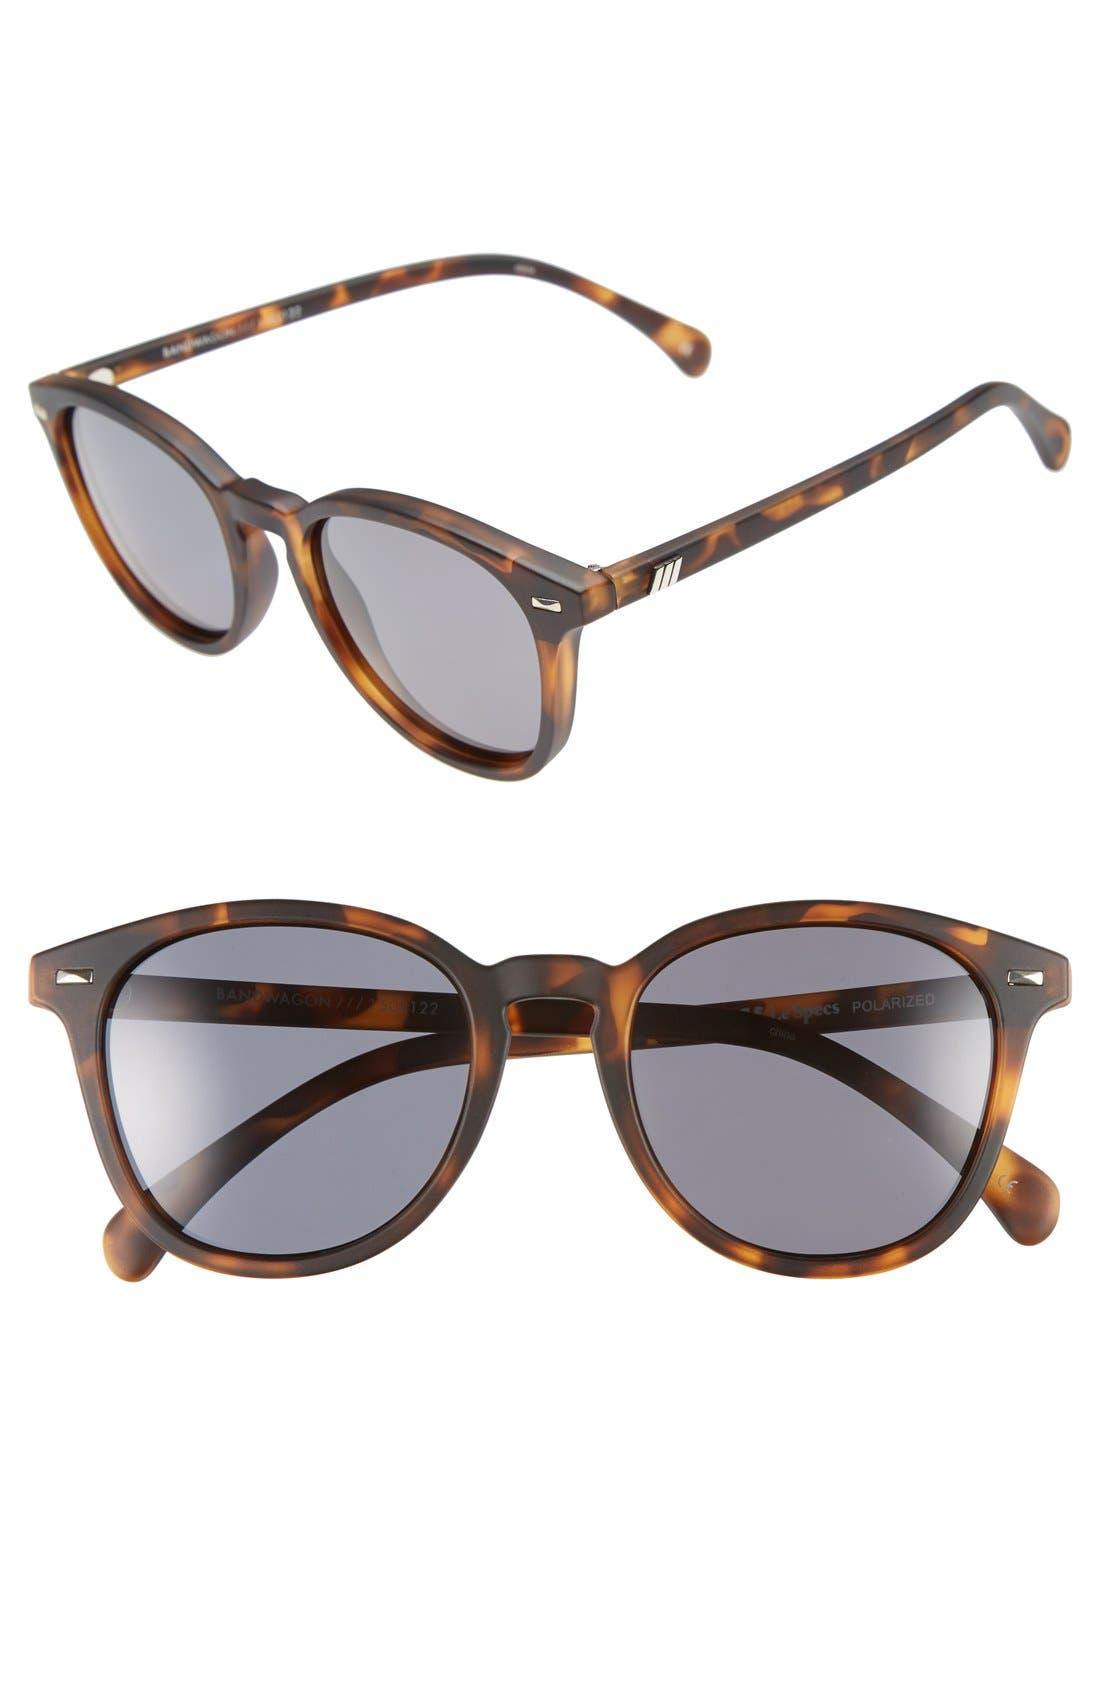 'Bandwagon' 51mm Polarized Sunglasses,                             Main thumbnail 1, color,                             MATTE TORT/ SMOKE MONO POLAR